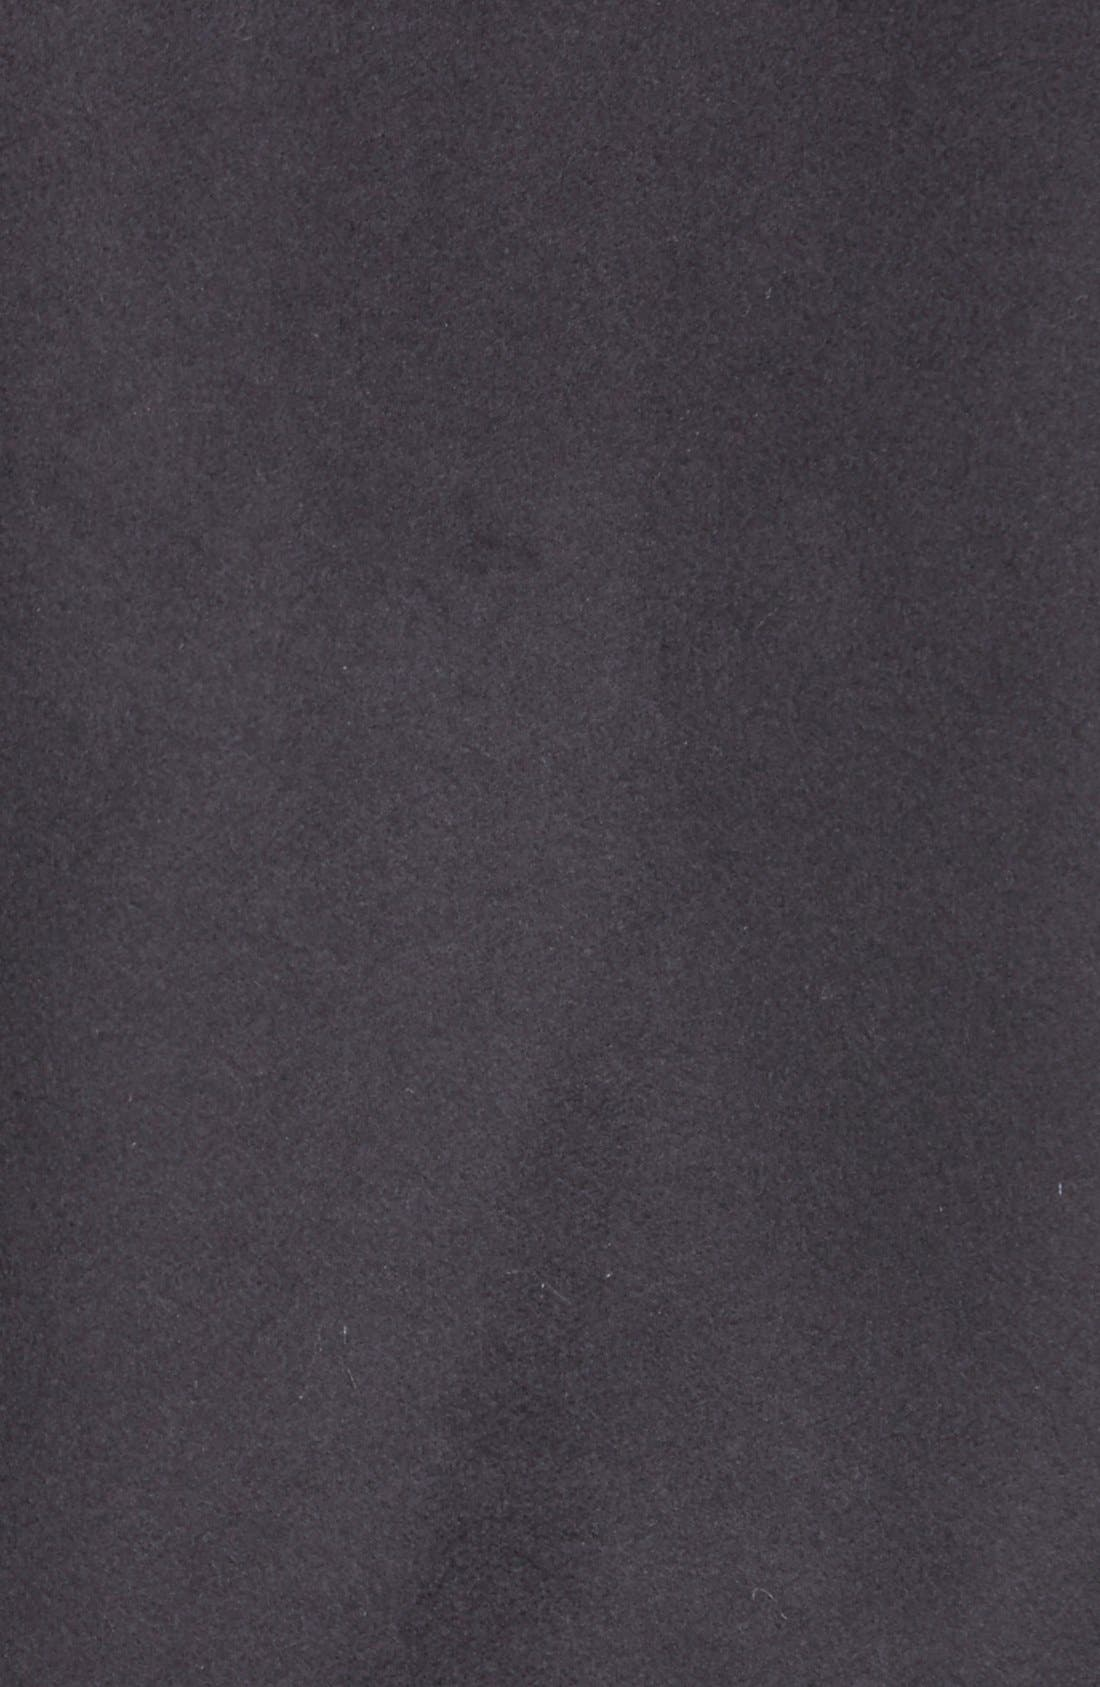 Alternate Image 3  - Barbour 'Carston' Faux Fur Trim Hooded Wool Blend Jacket